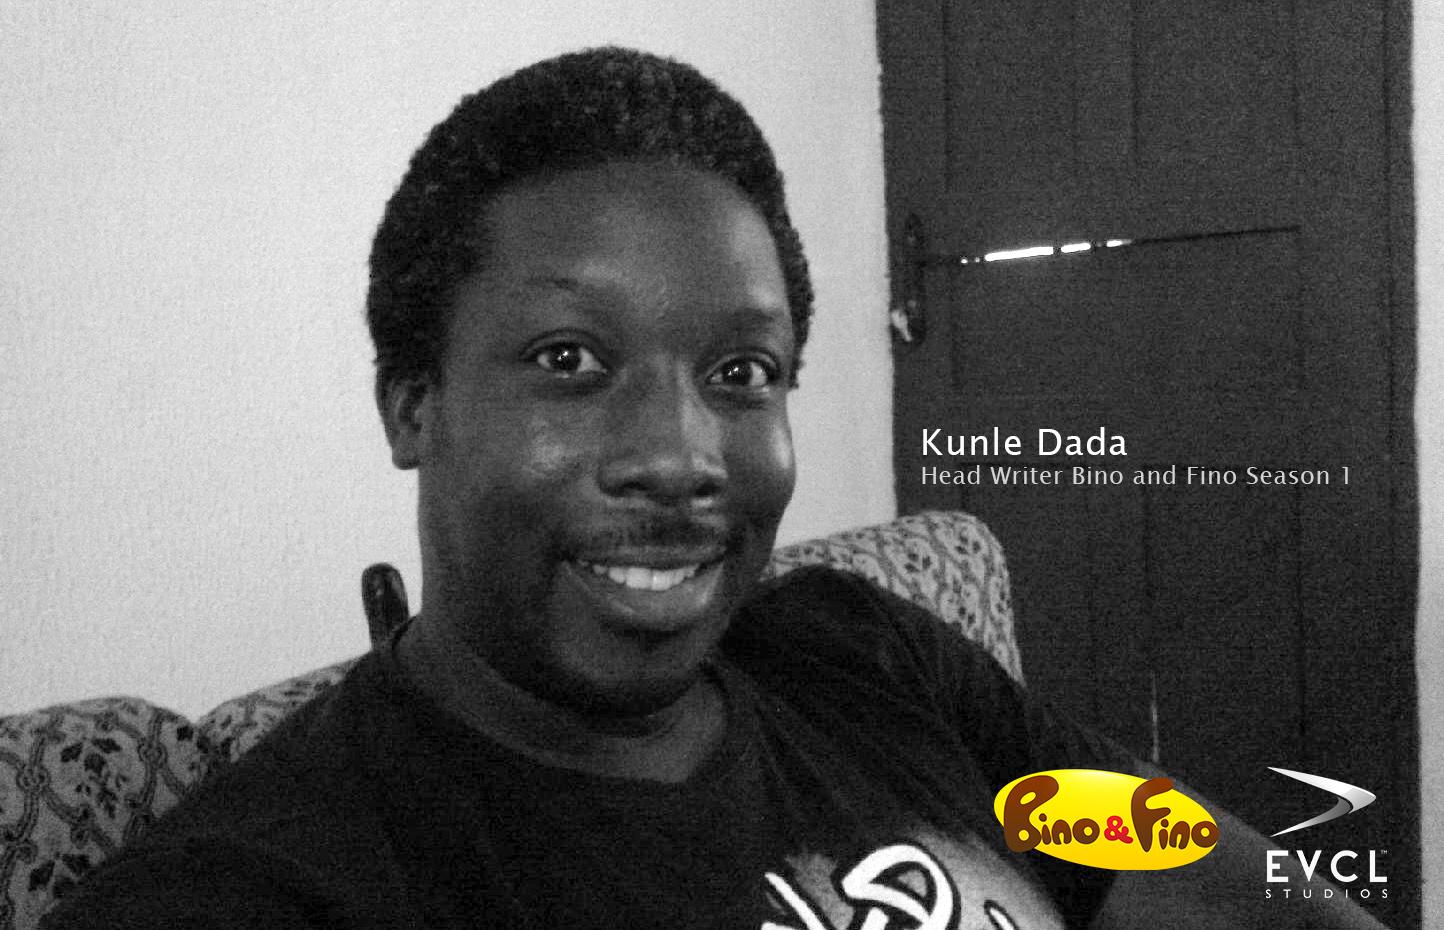 Kunle Dada: Head Writer Bino and Fino Season 1